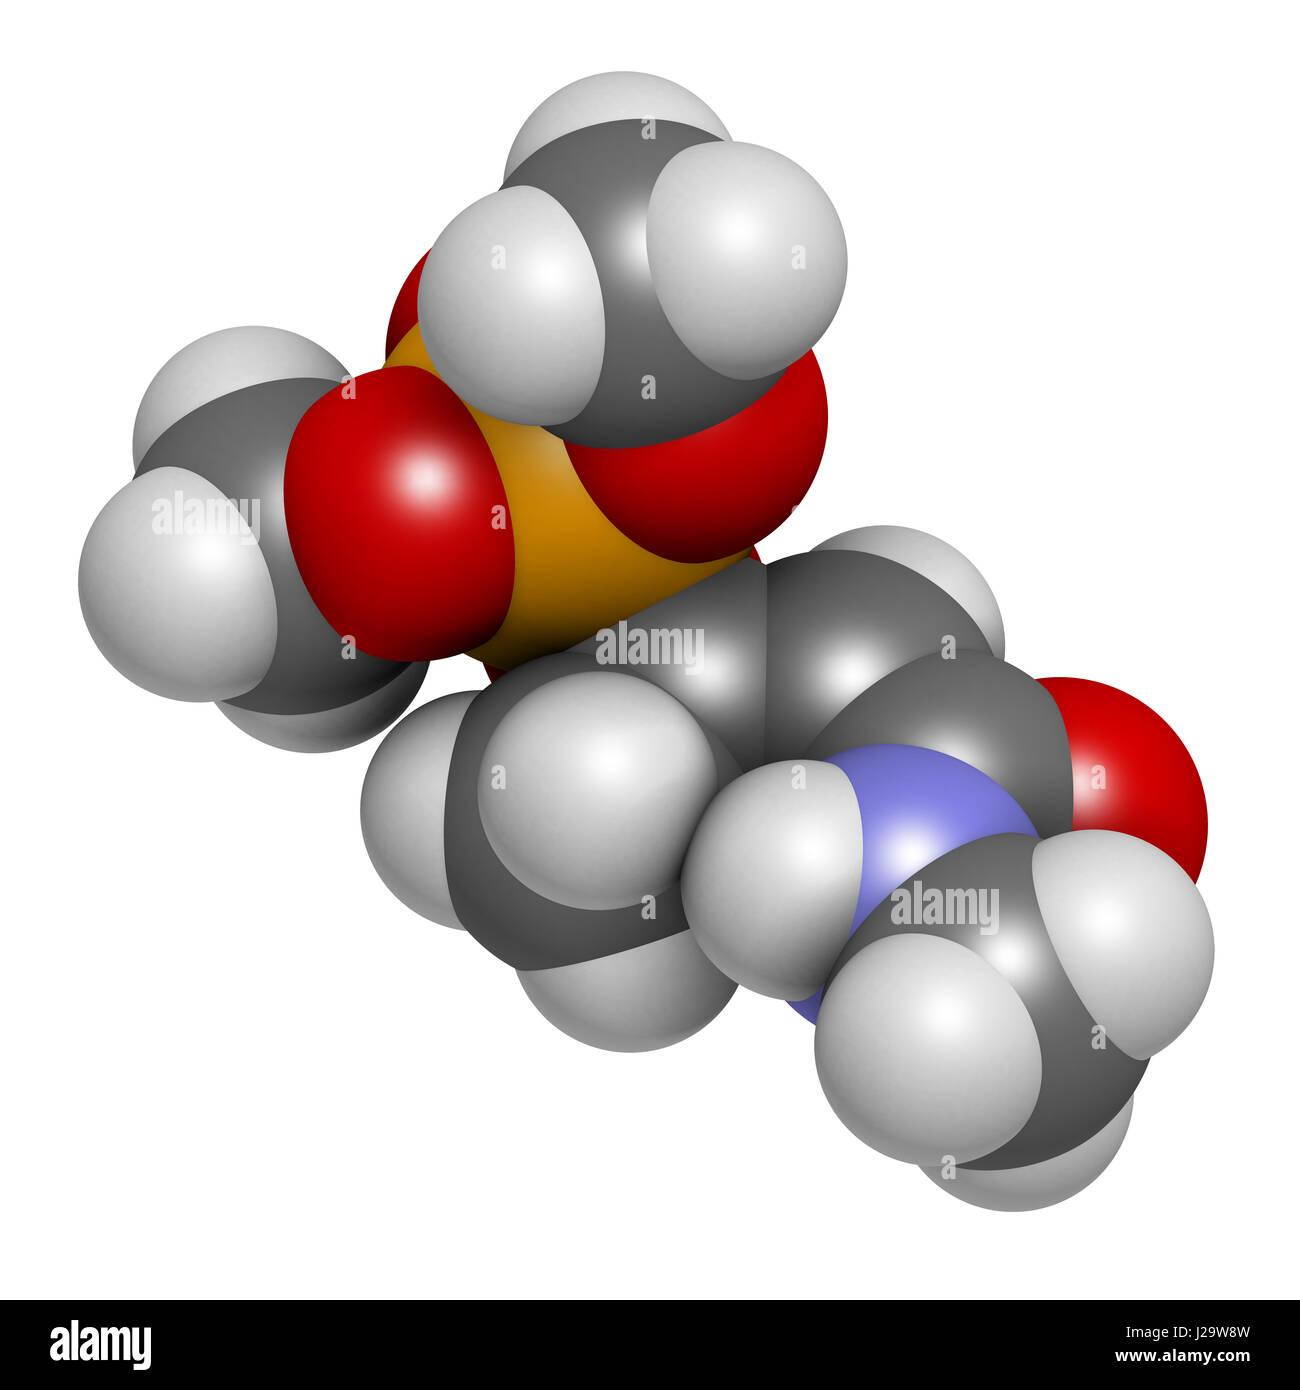 organophosphate pesticides